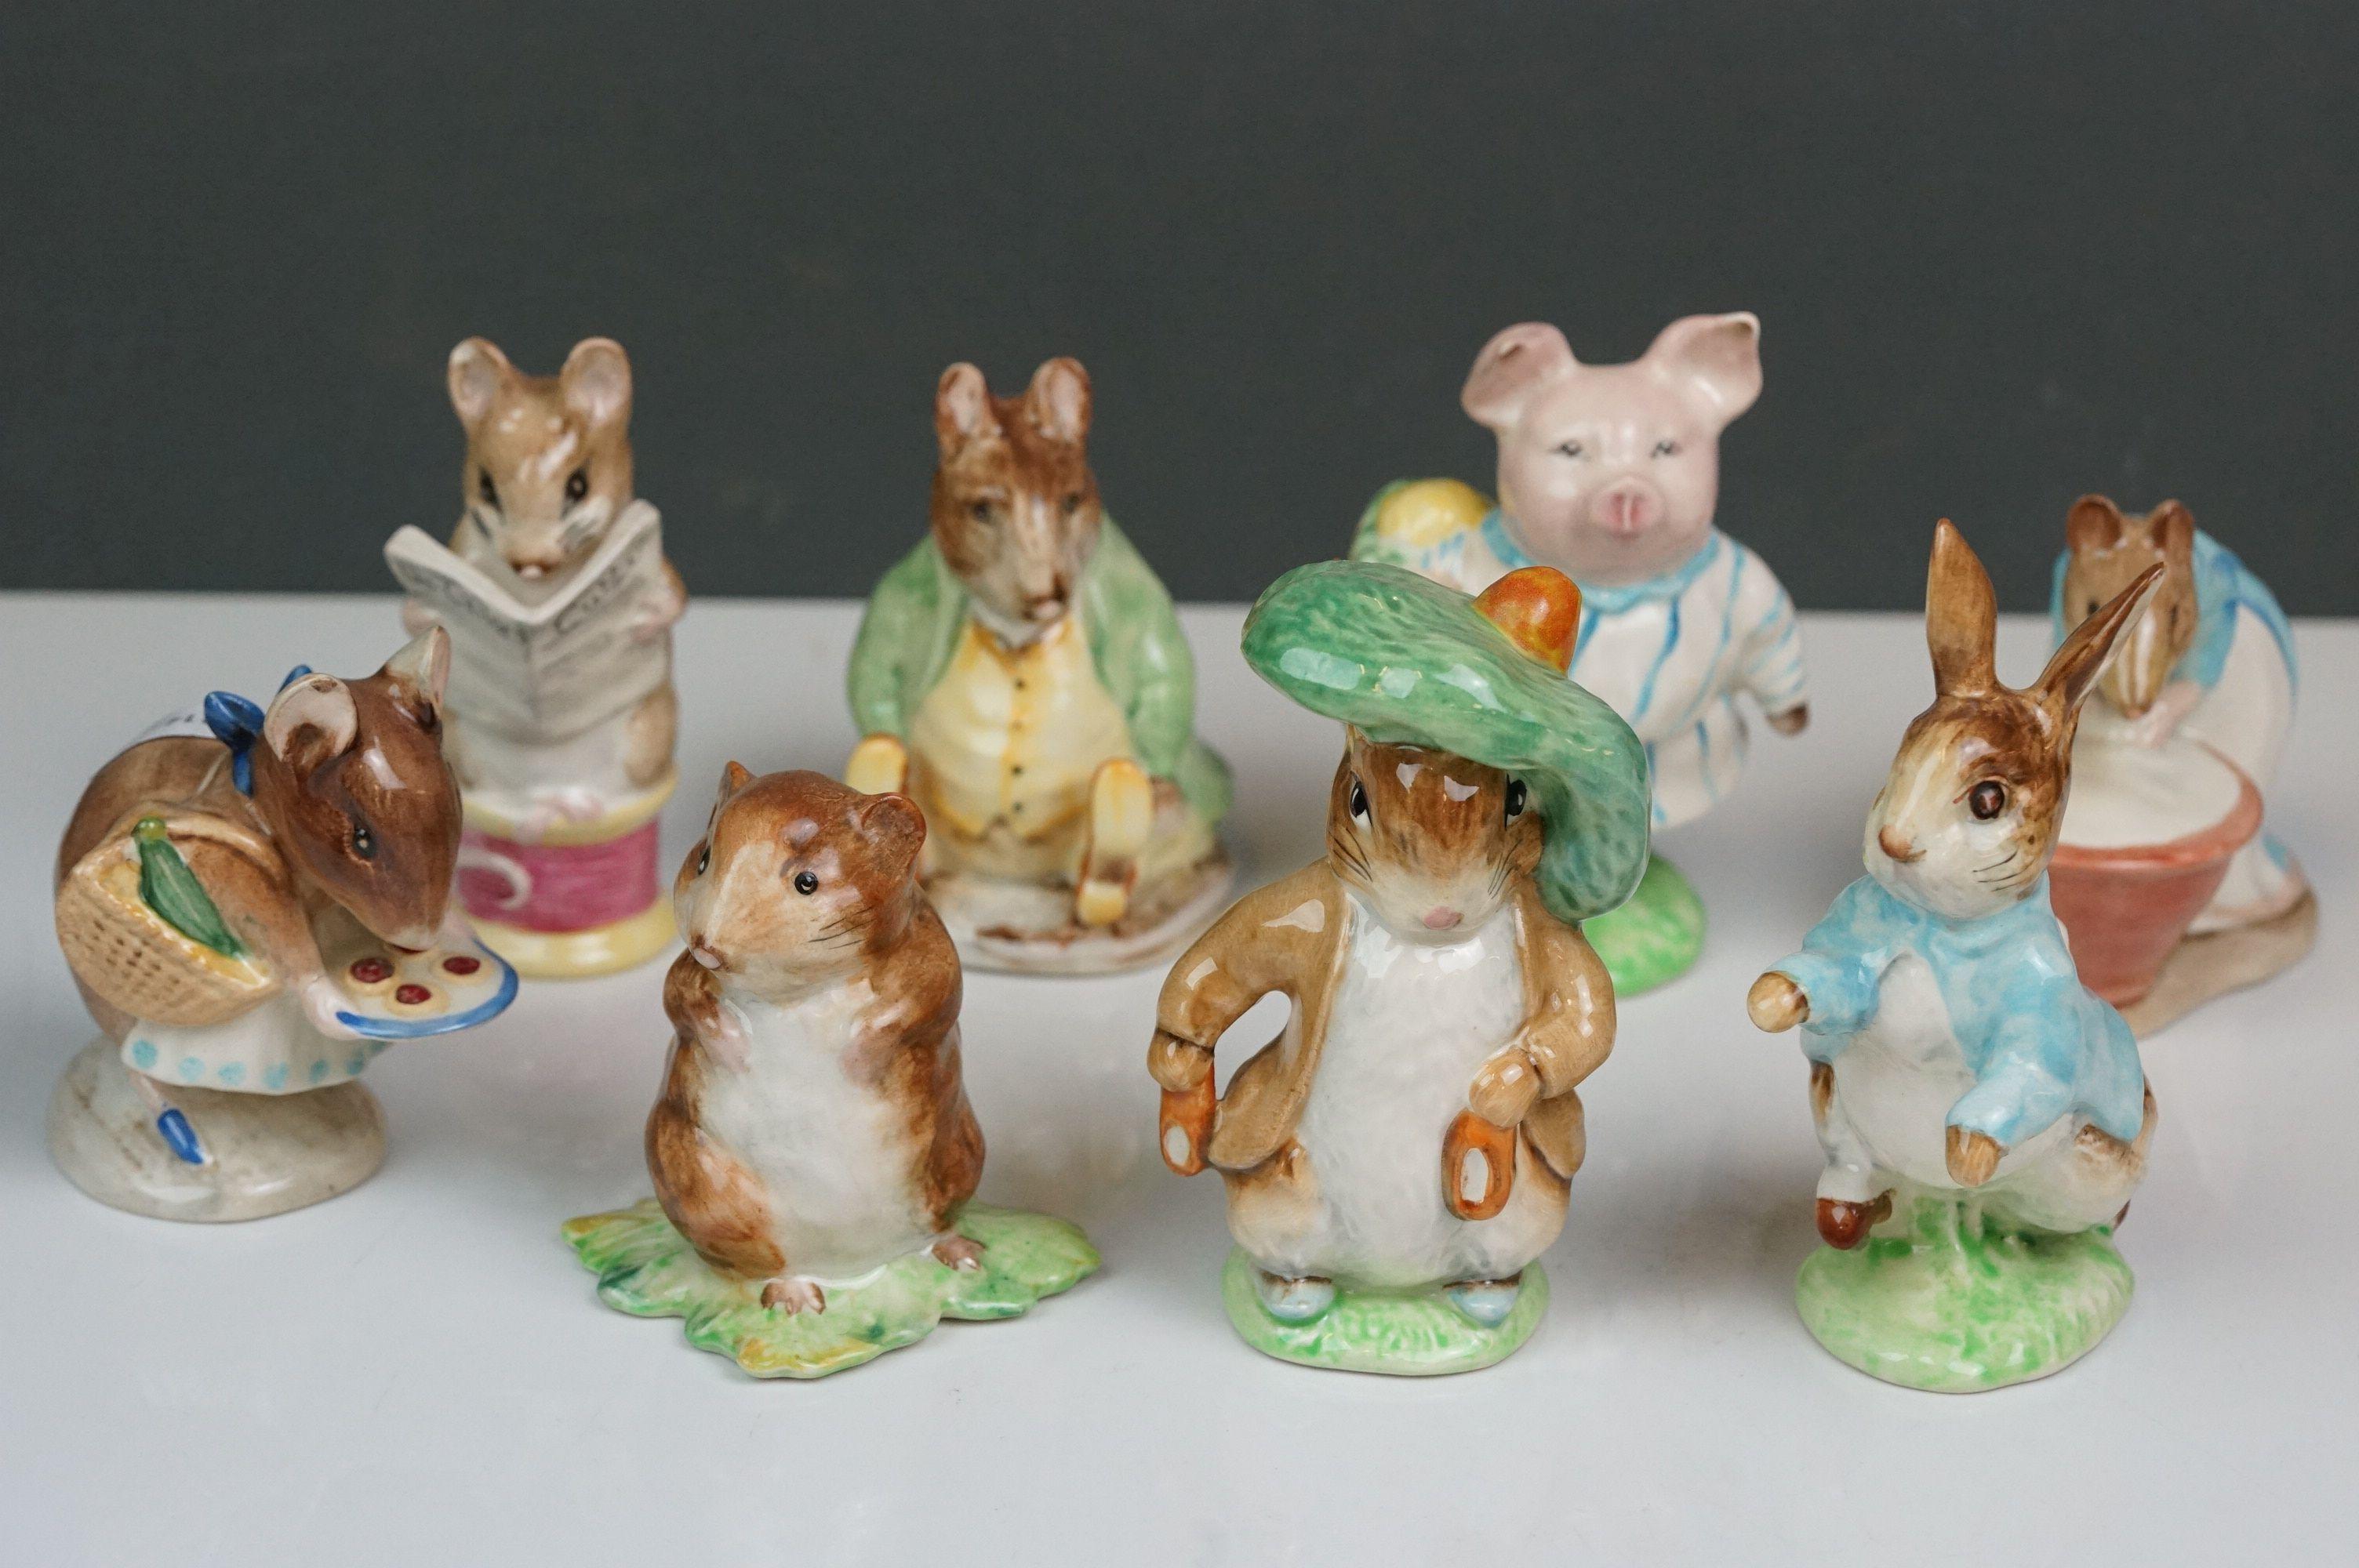 Eight Beswick Beatrix Potter figures comprising Appley Dapply; Timmy Willie; Peter Rabbit; Samuel